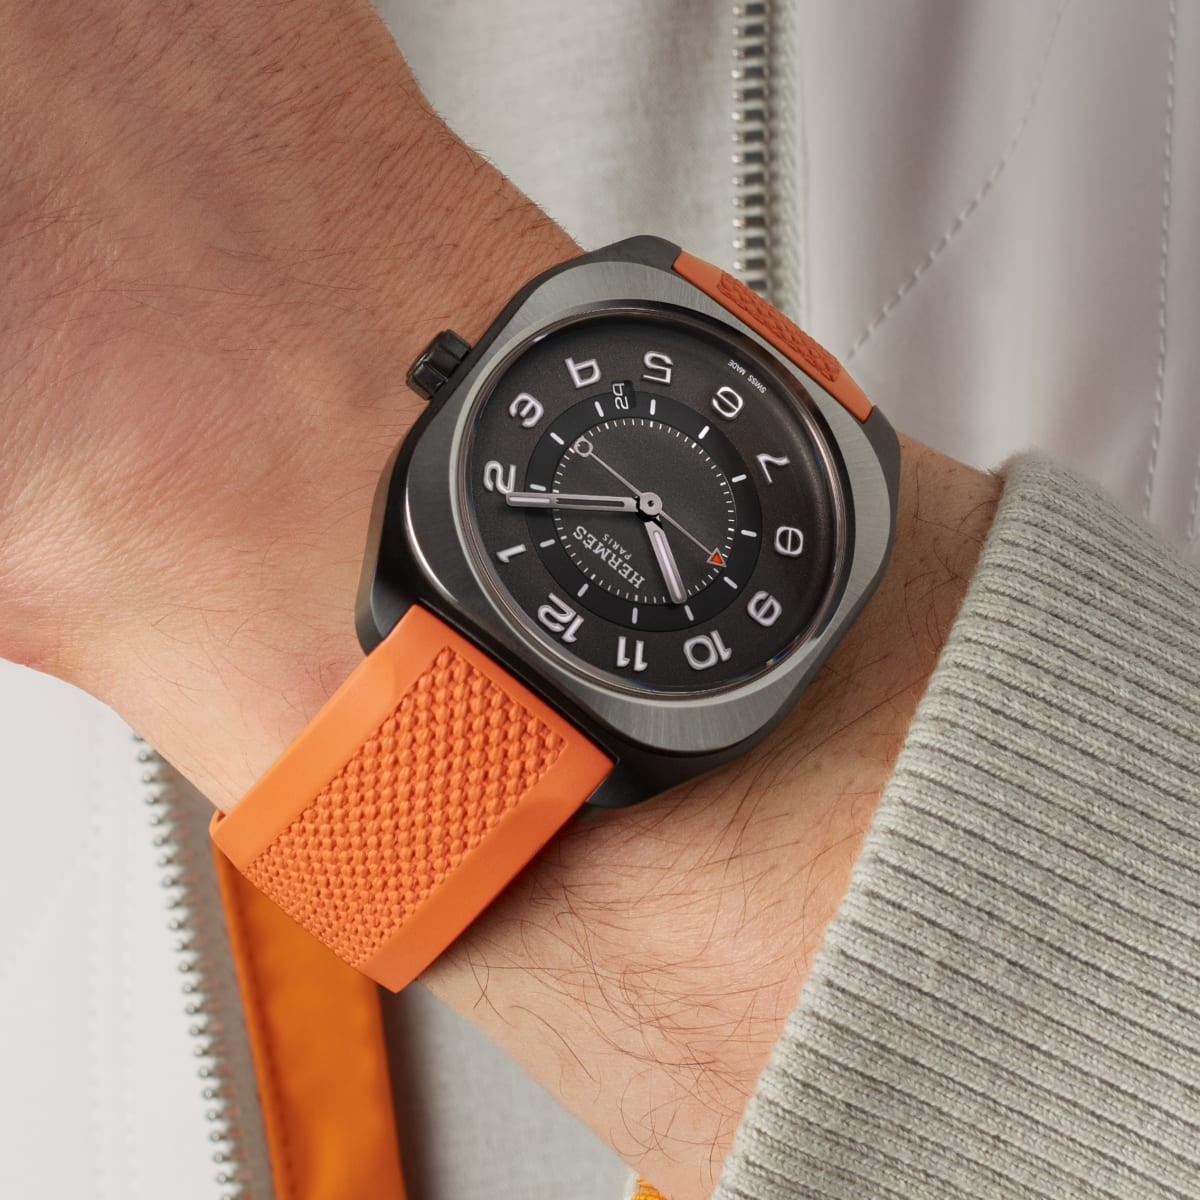 Hermès H08 watch 2021 novelty at Watches & Wonders